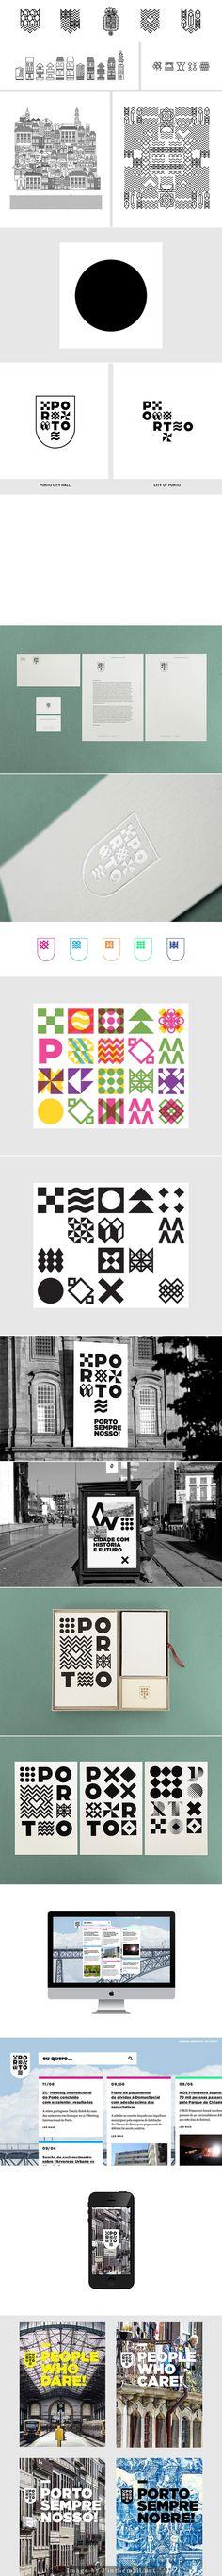 Porto / City Identity and Branding Proposal by Atelier Martino&Jaña.